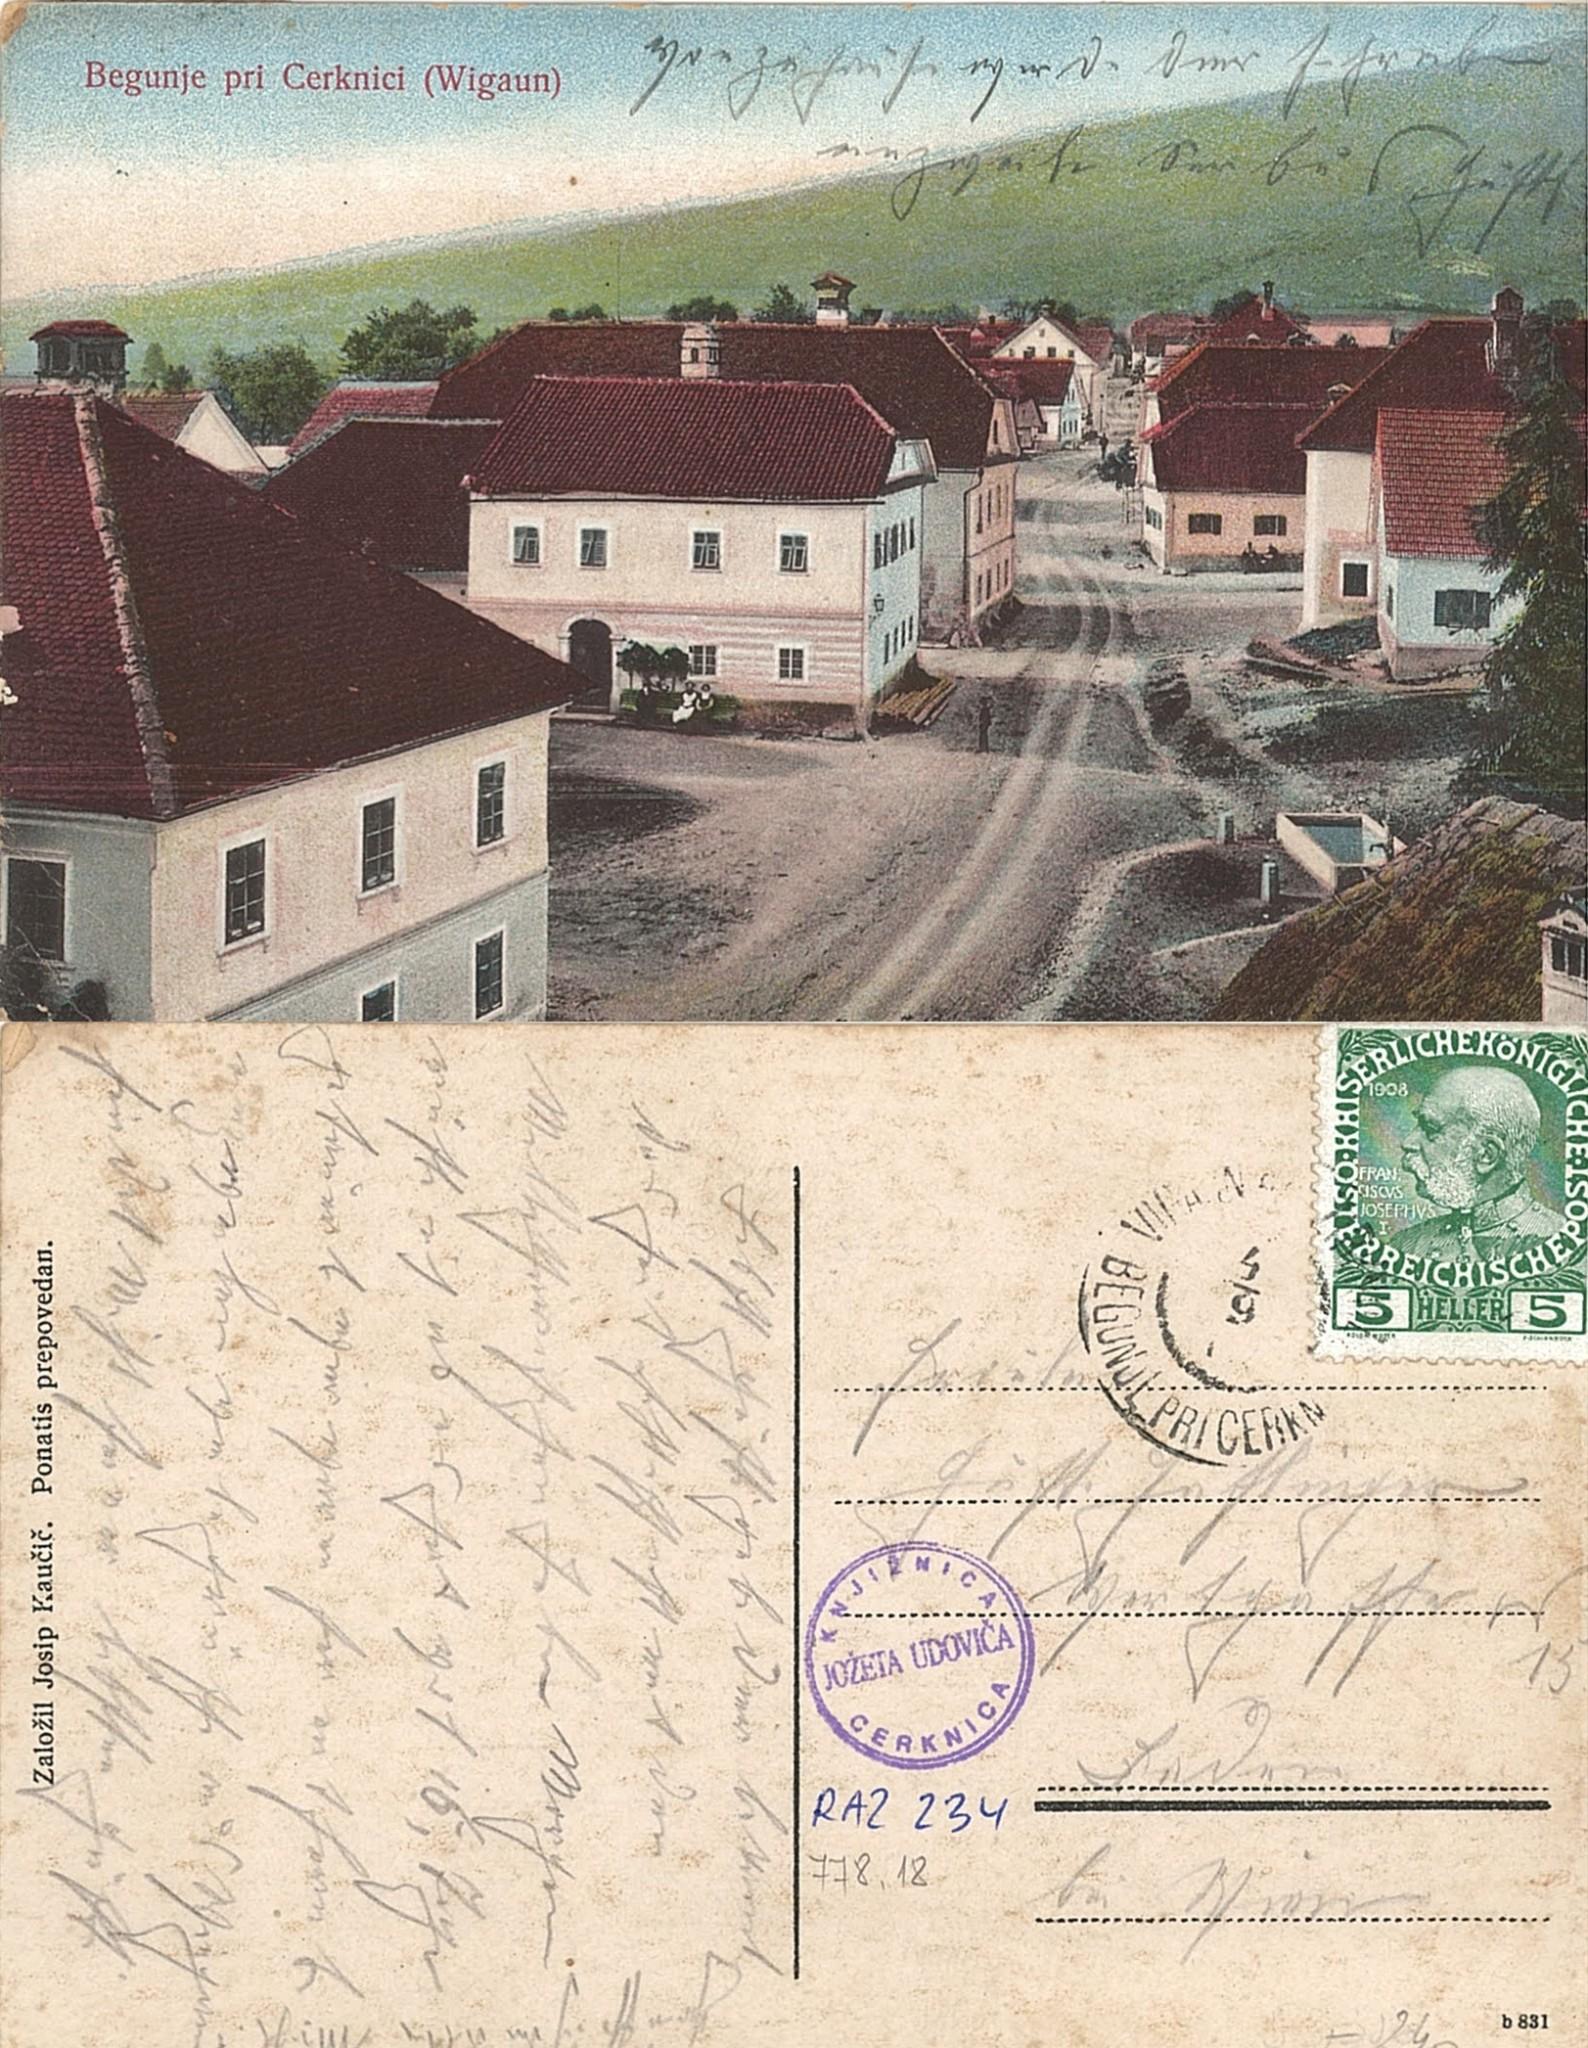 begunje13 - Begunje